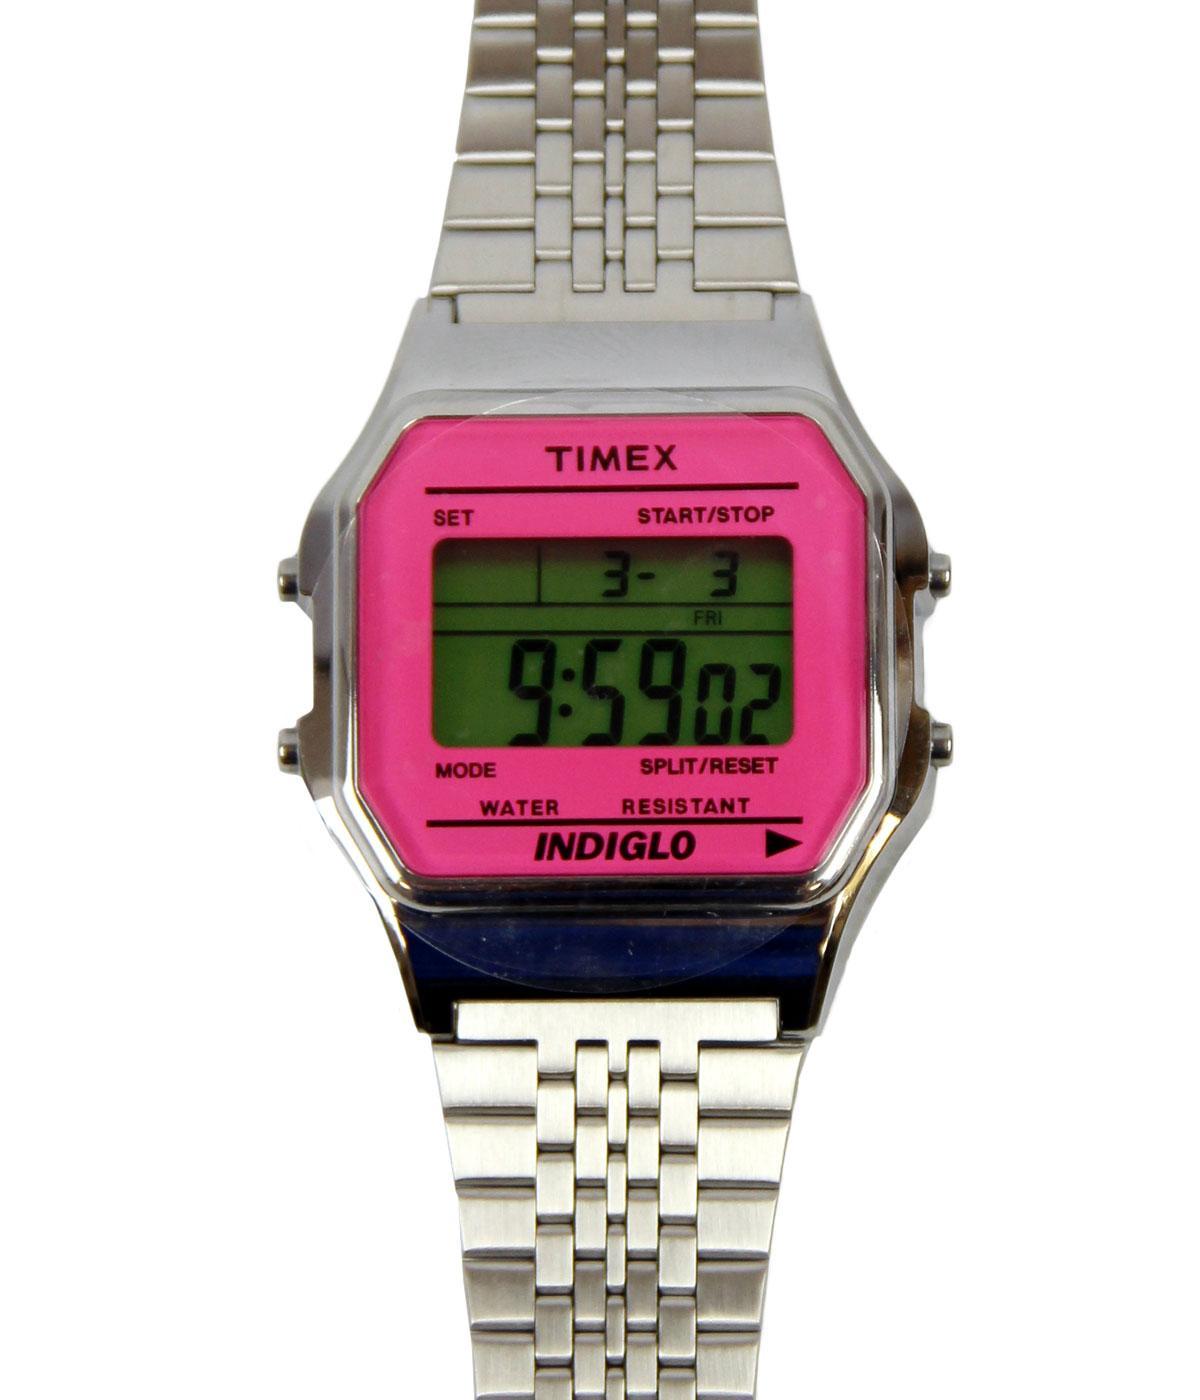 TIMEX 80 Retro 1980s Silvertone Watch w/Pink Lens